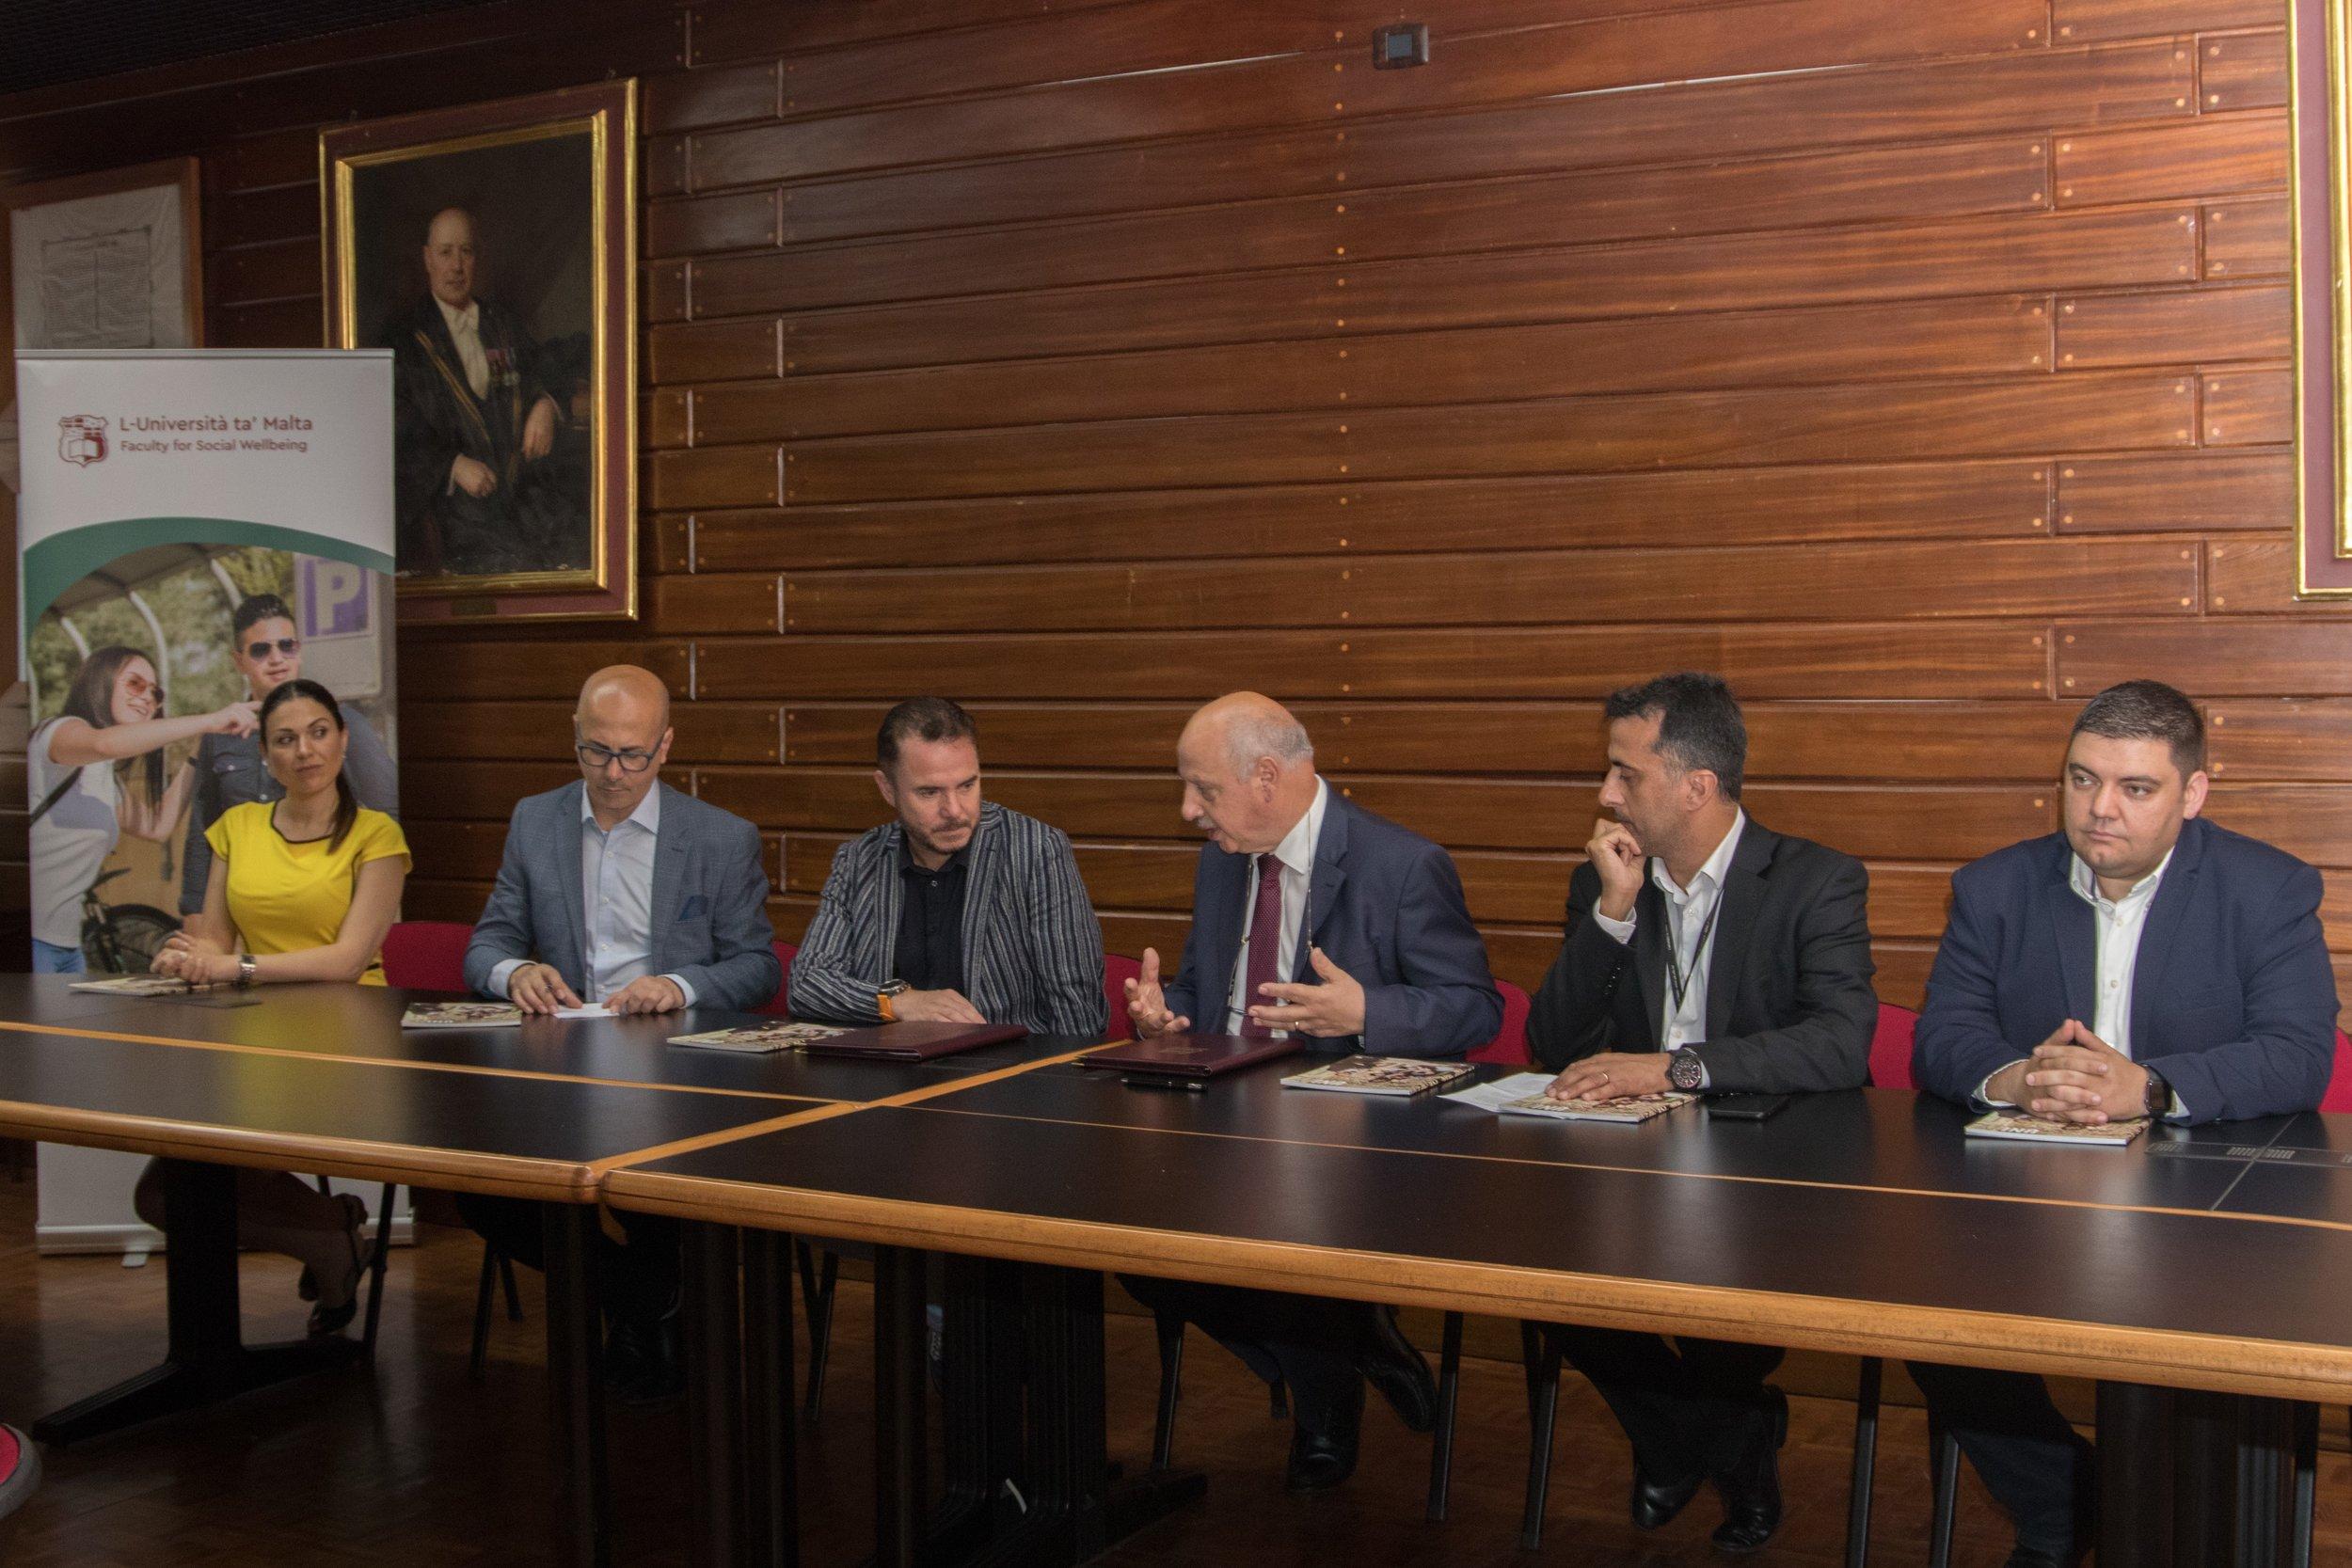 Left to right - Dr Maria Brown, Alfred Zammit, Mark Weingard, Prof. Alfred J. Vella, Prof. Andrew Azzopardi, Prof. Alexiei Dingli